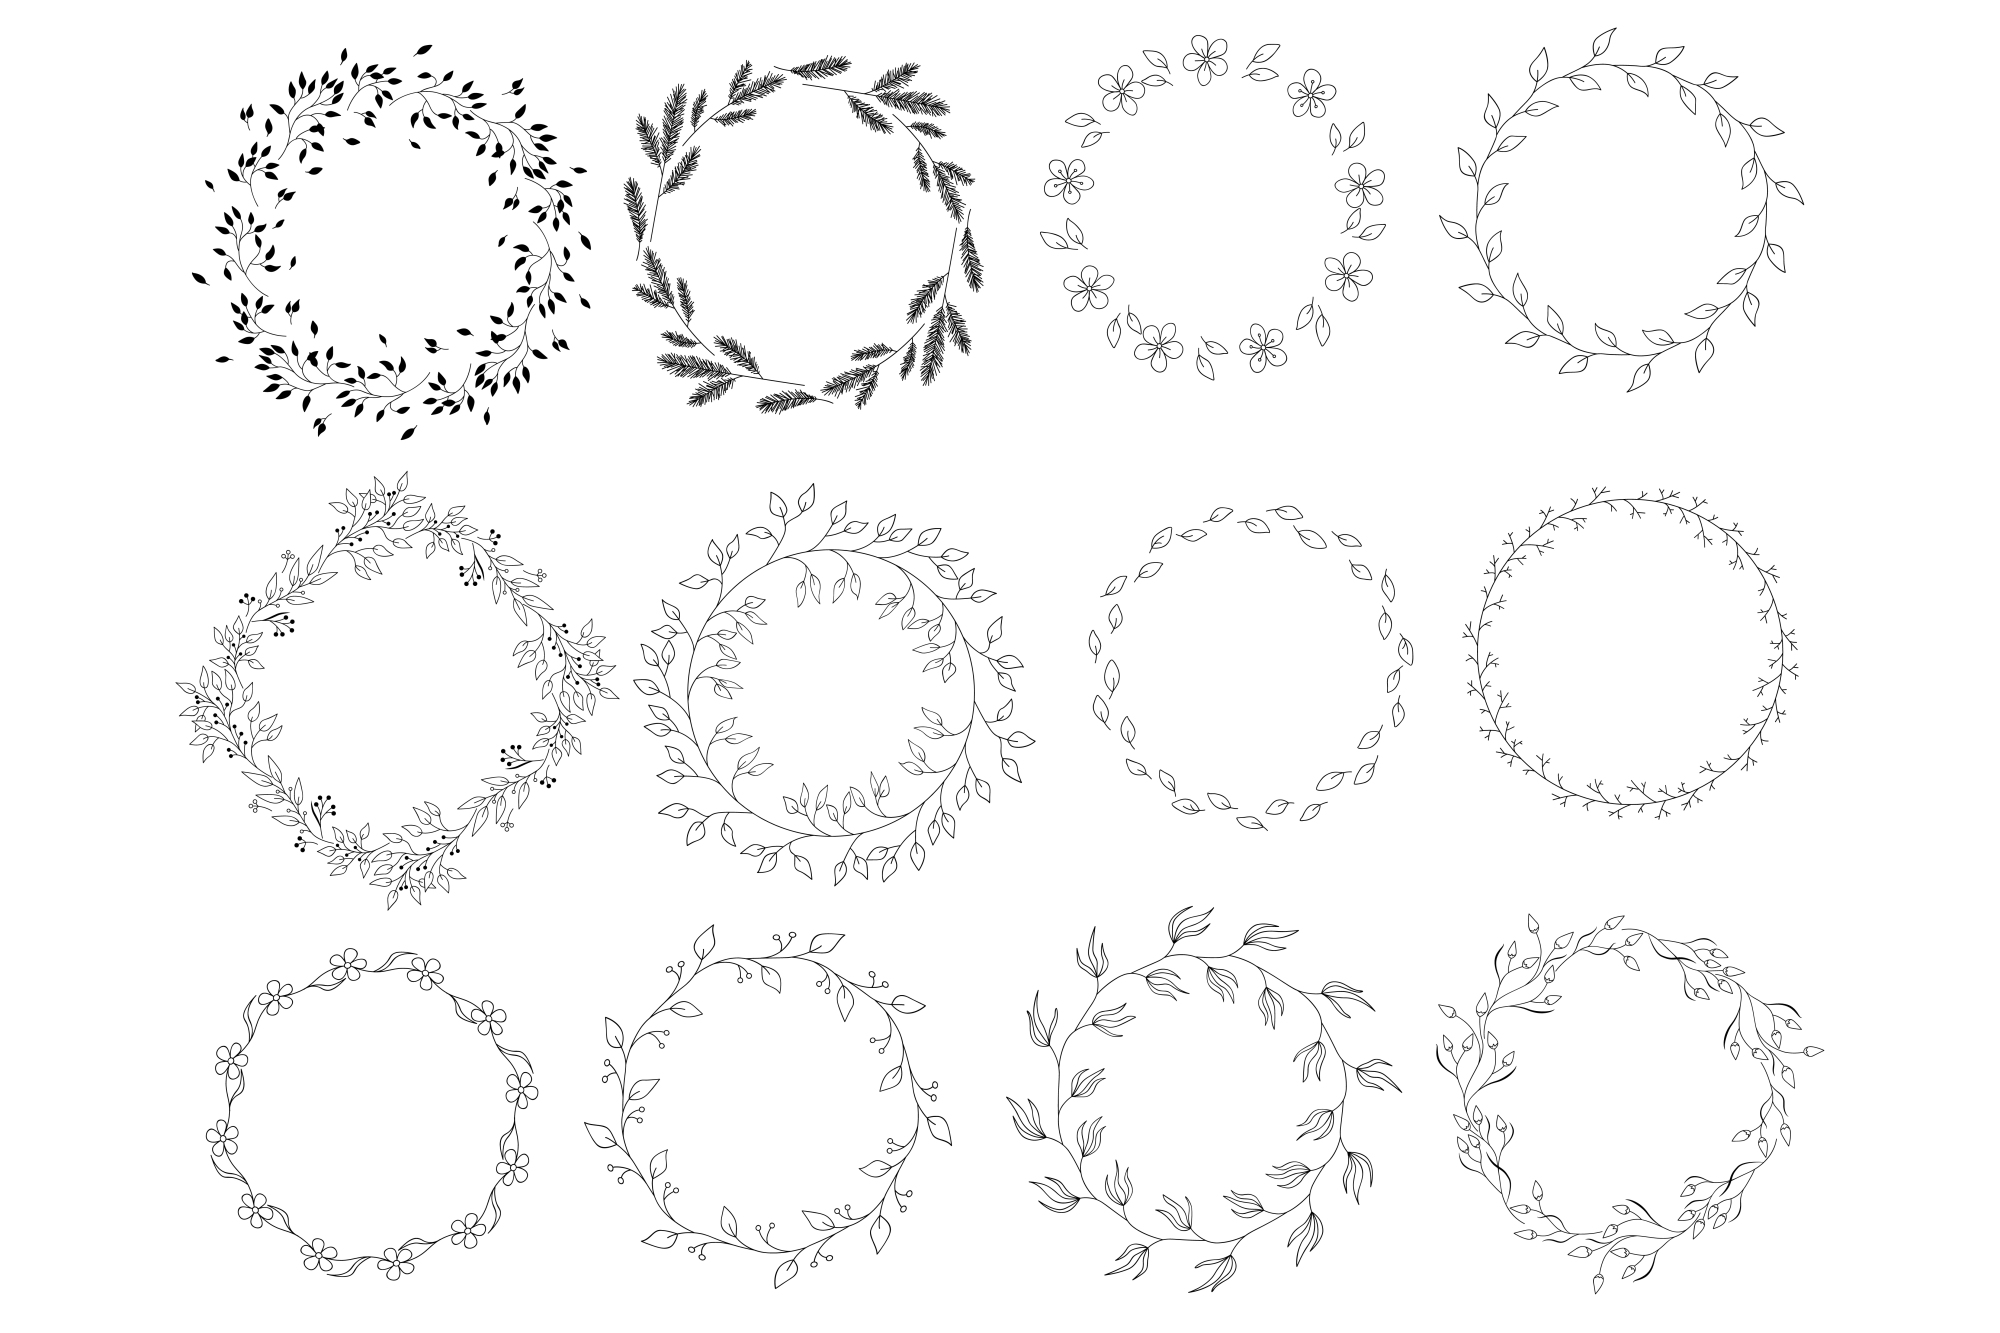 450 handsketched elements. Nature mega pack example image 17